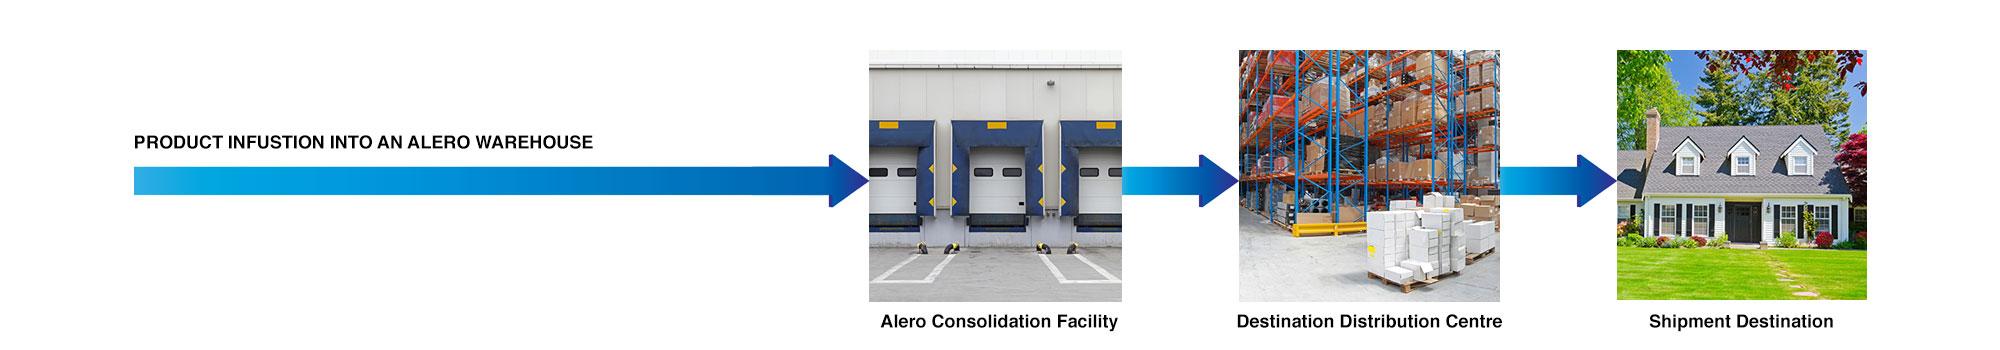 Alero-Consolidation-Facility